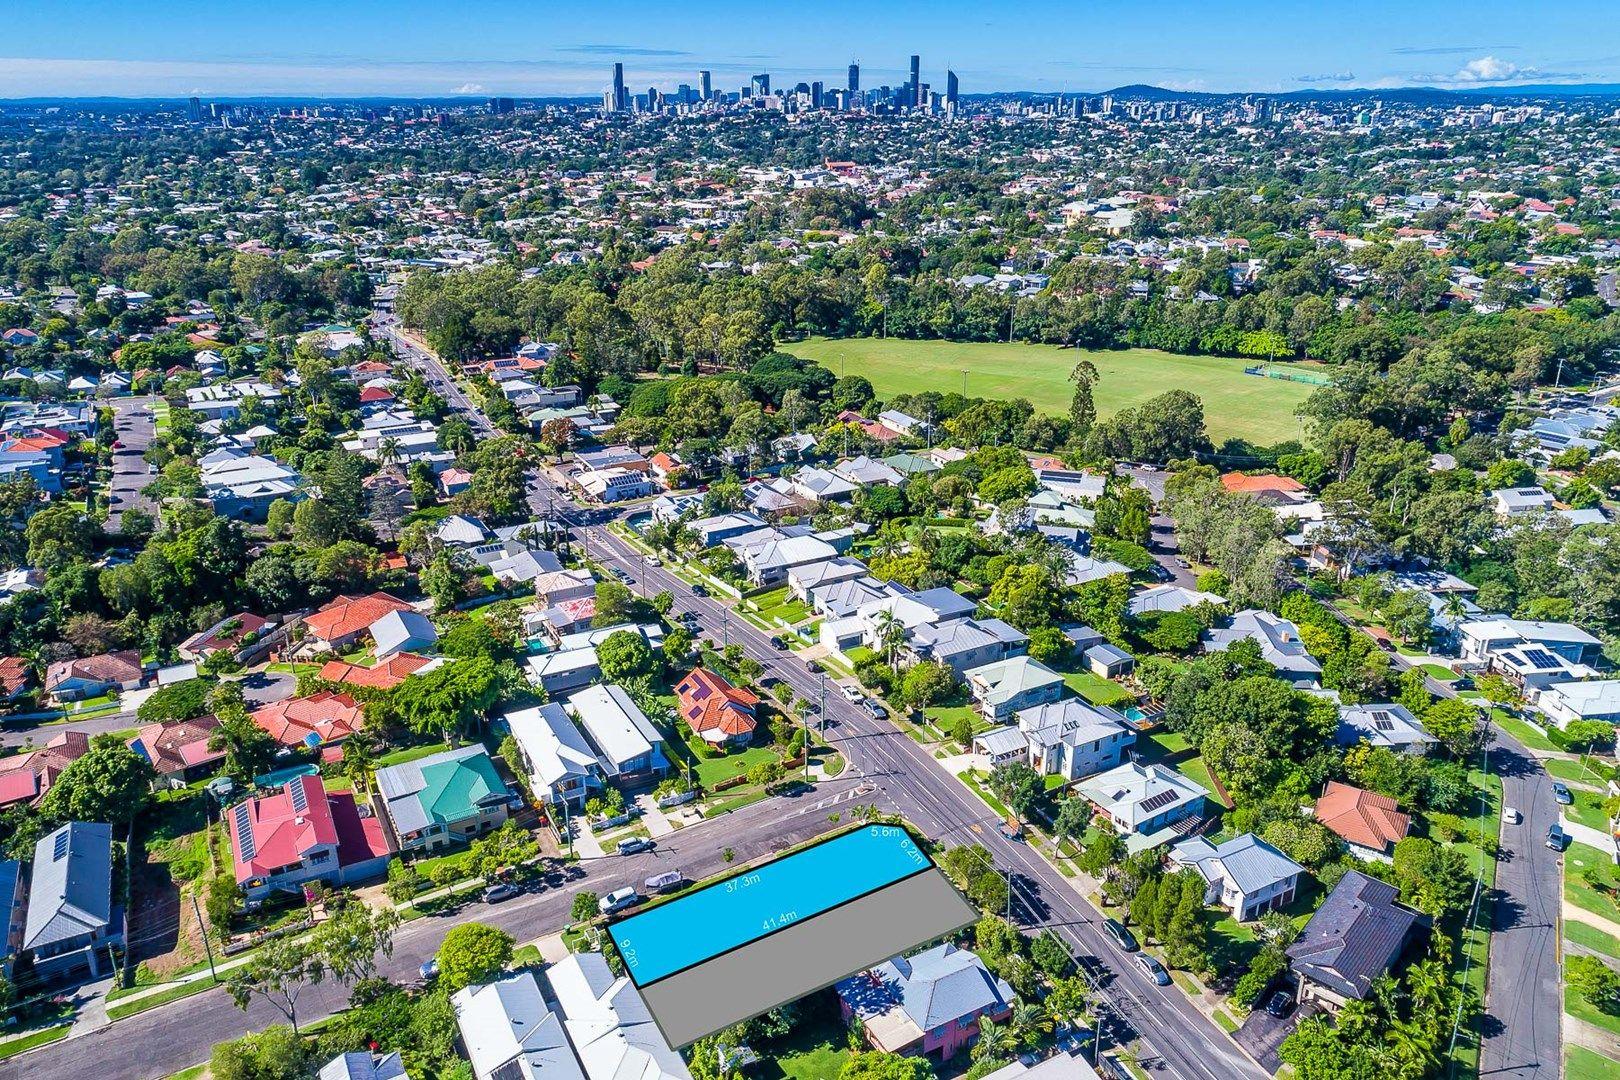 Lot 6, 101 Frasers Road, Ashgrove QLD 4060, Image 0